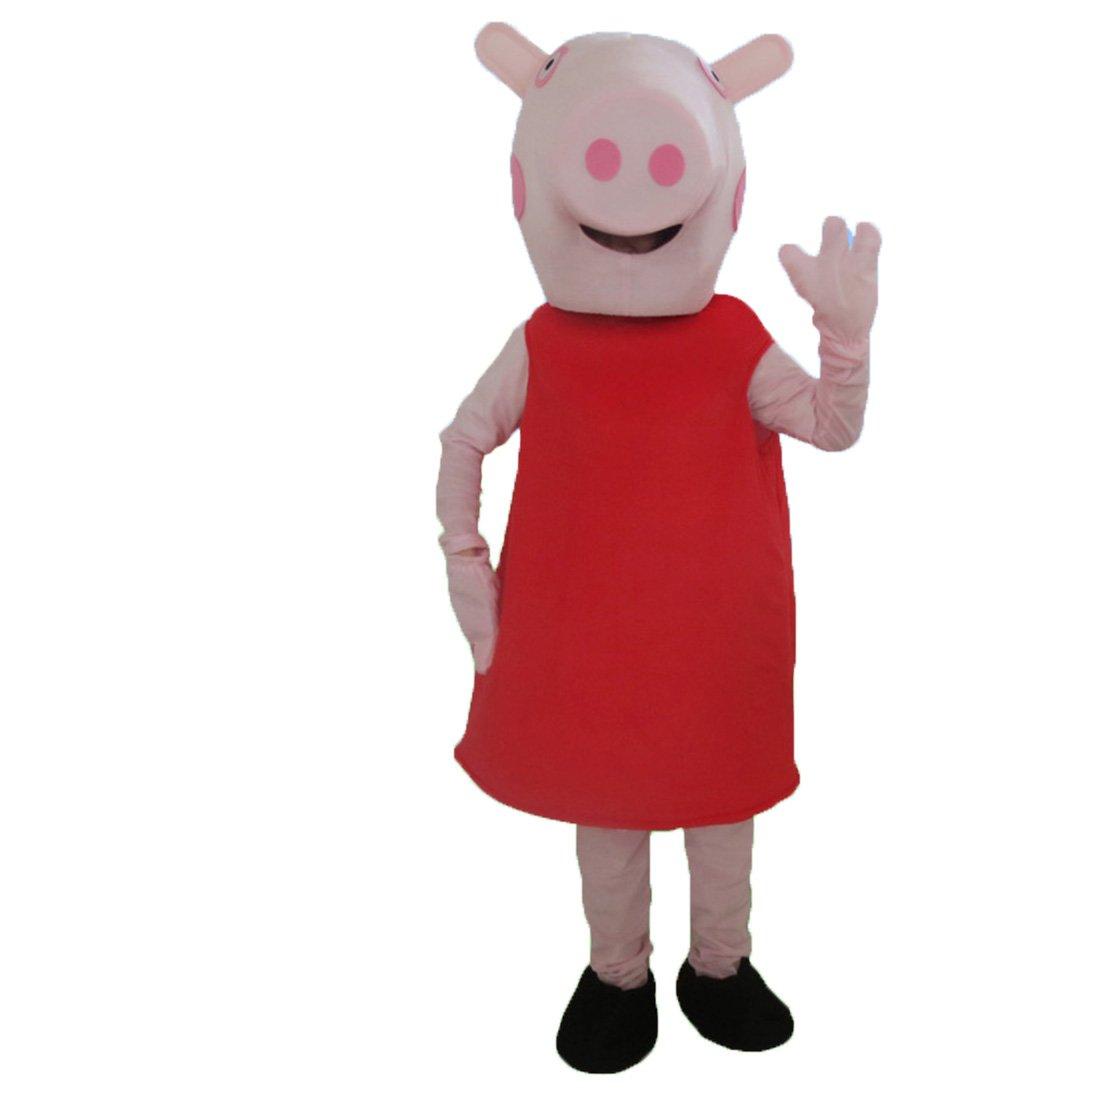 Alkem Unisex Peppa Pig Mascot Costume (Red)